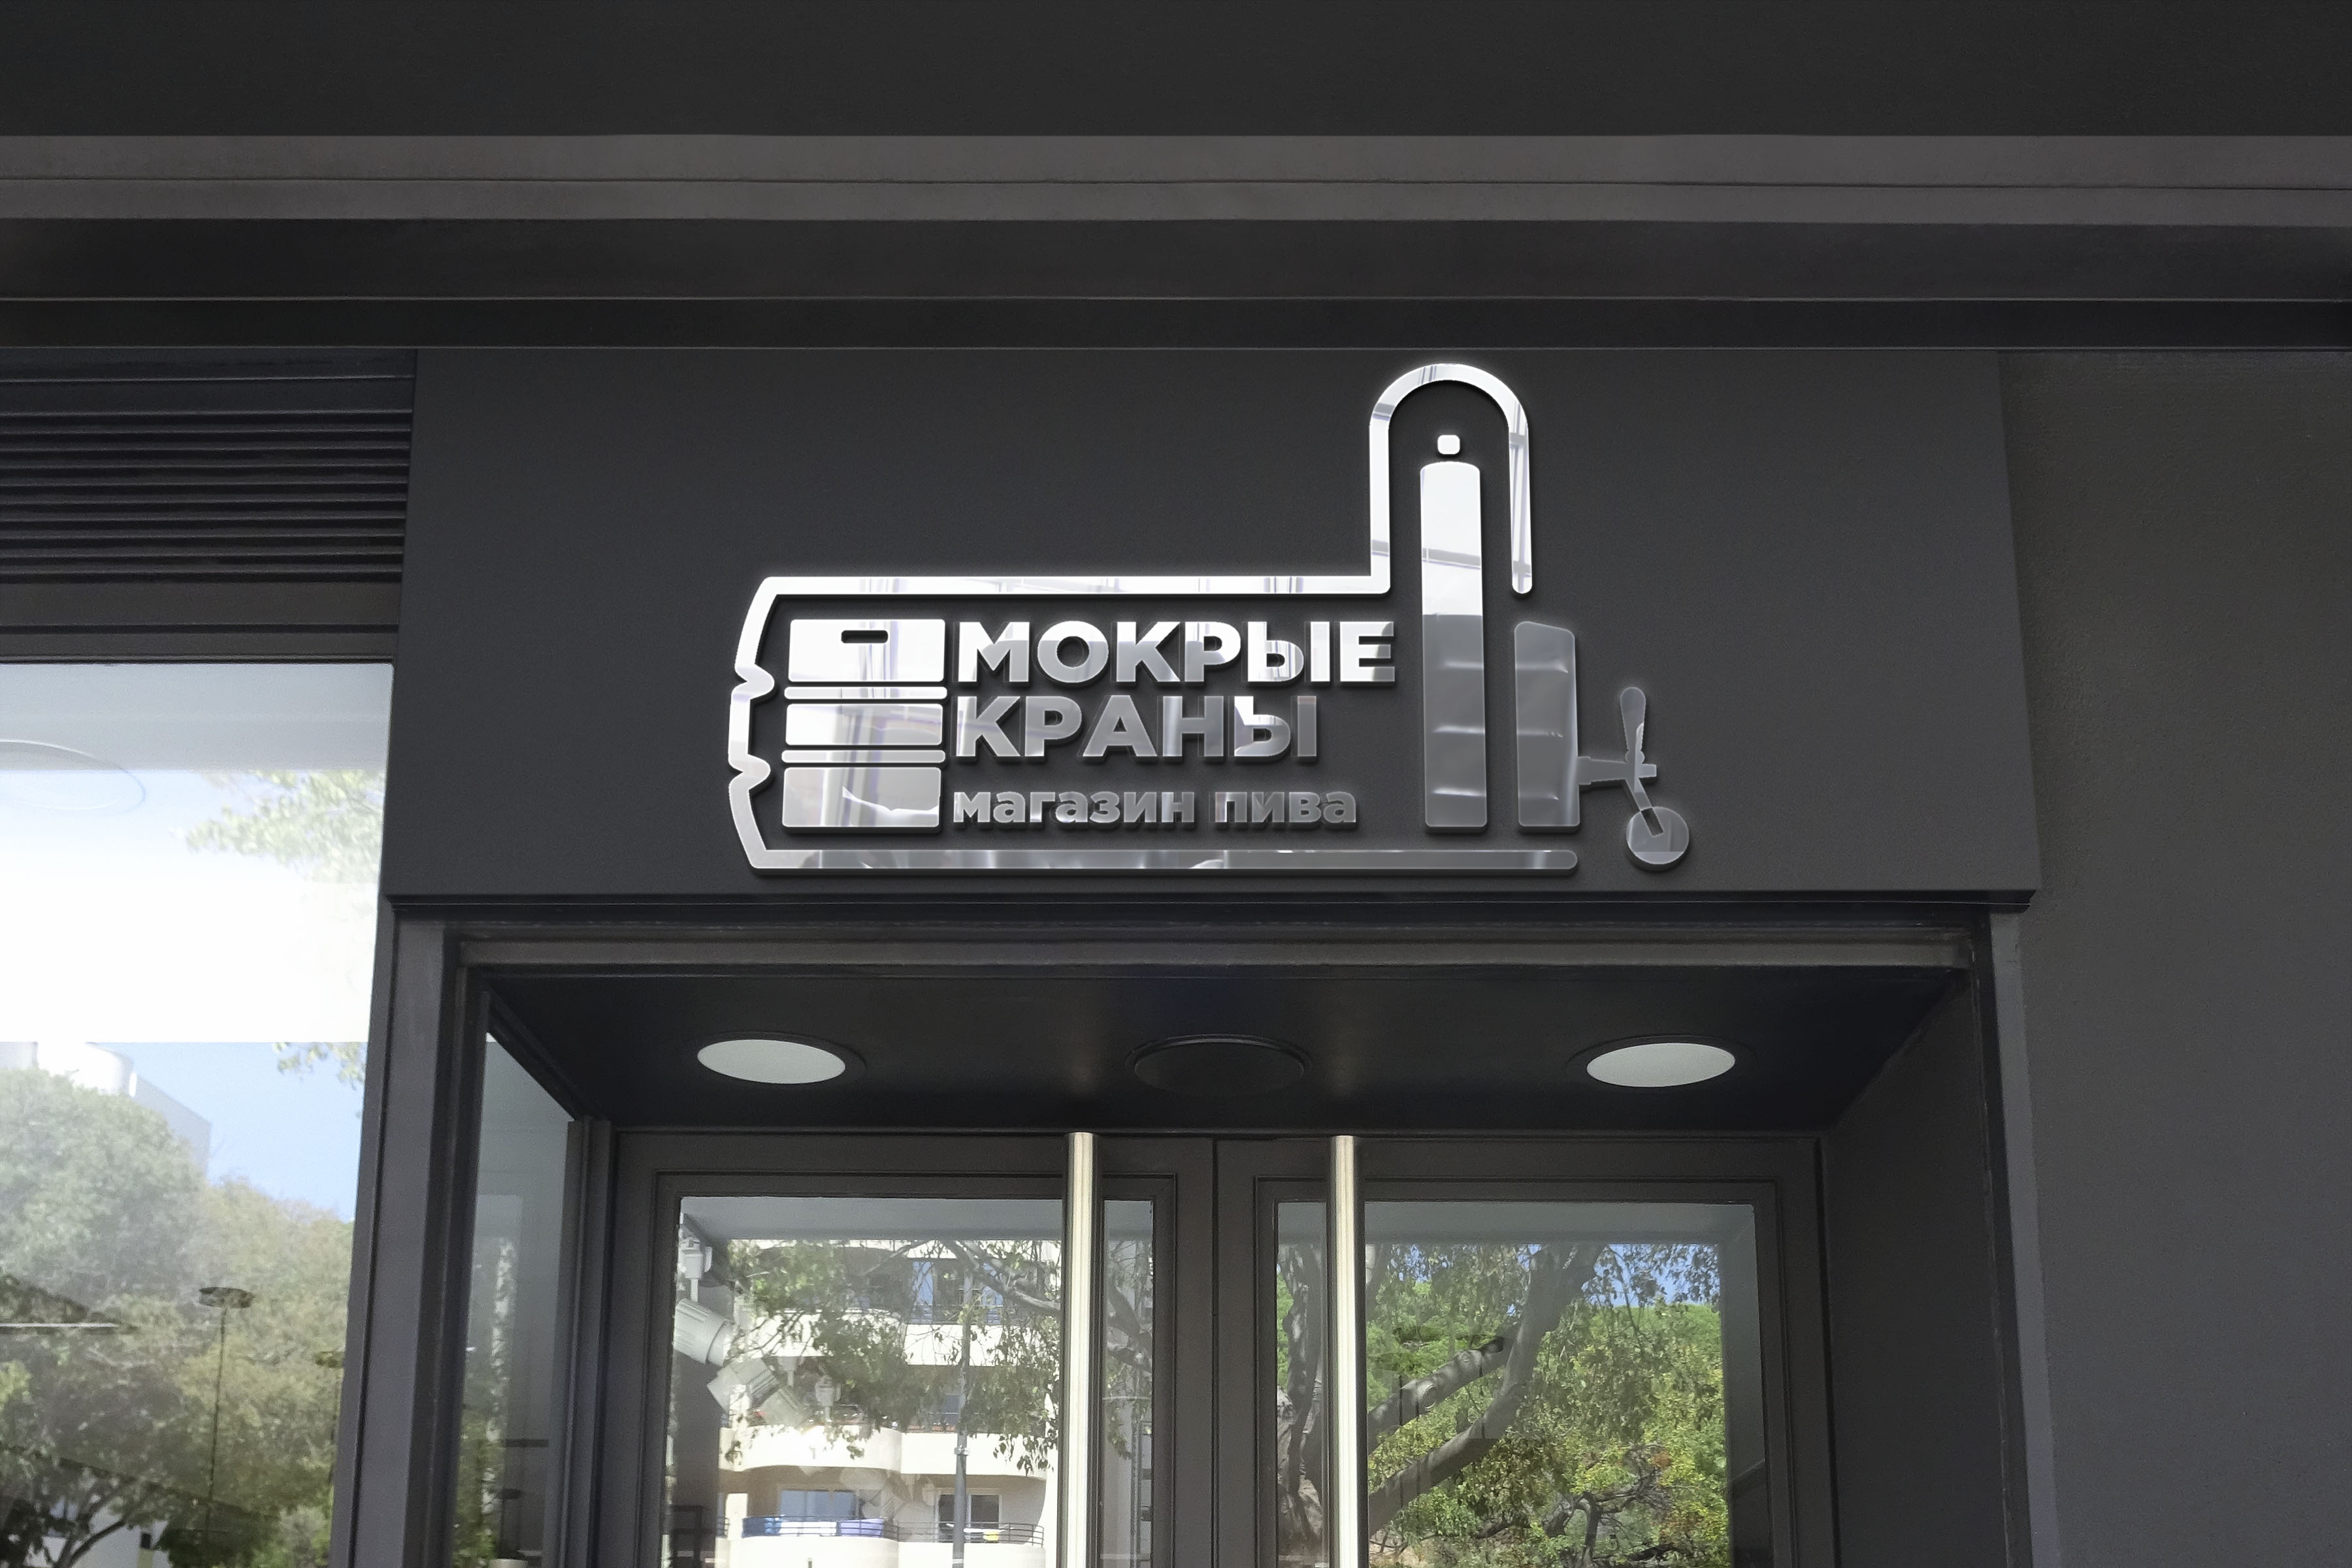 Вывеска/логотип для пивного магазина фото f_28760290abc2adac.jpg